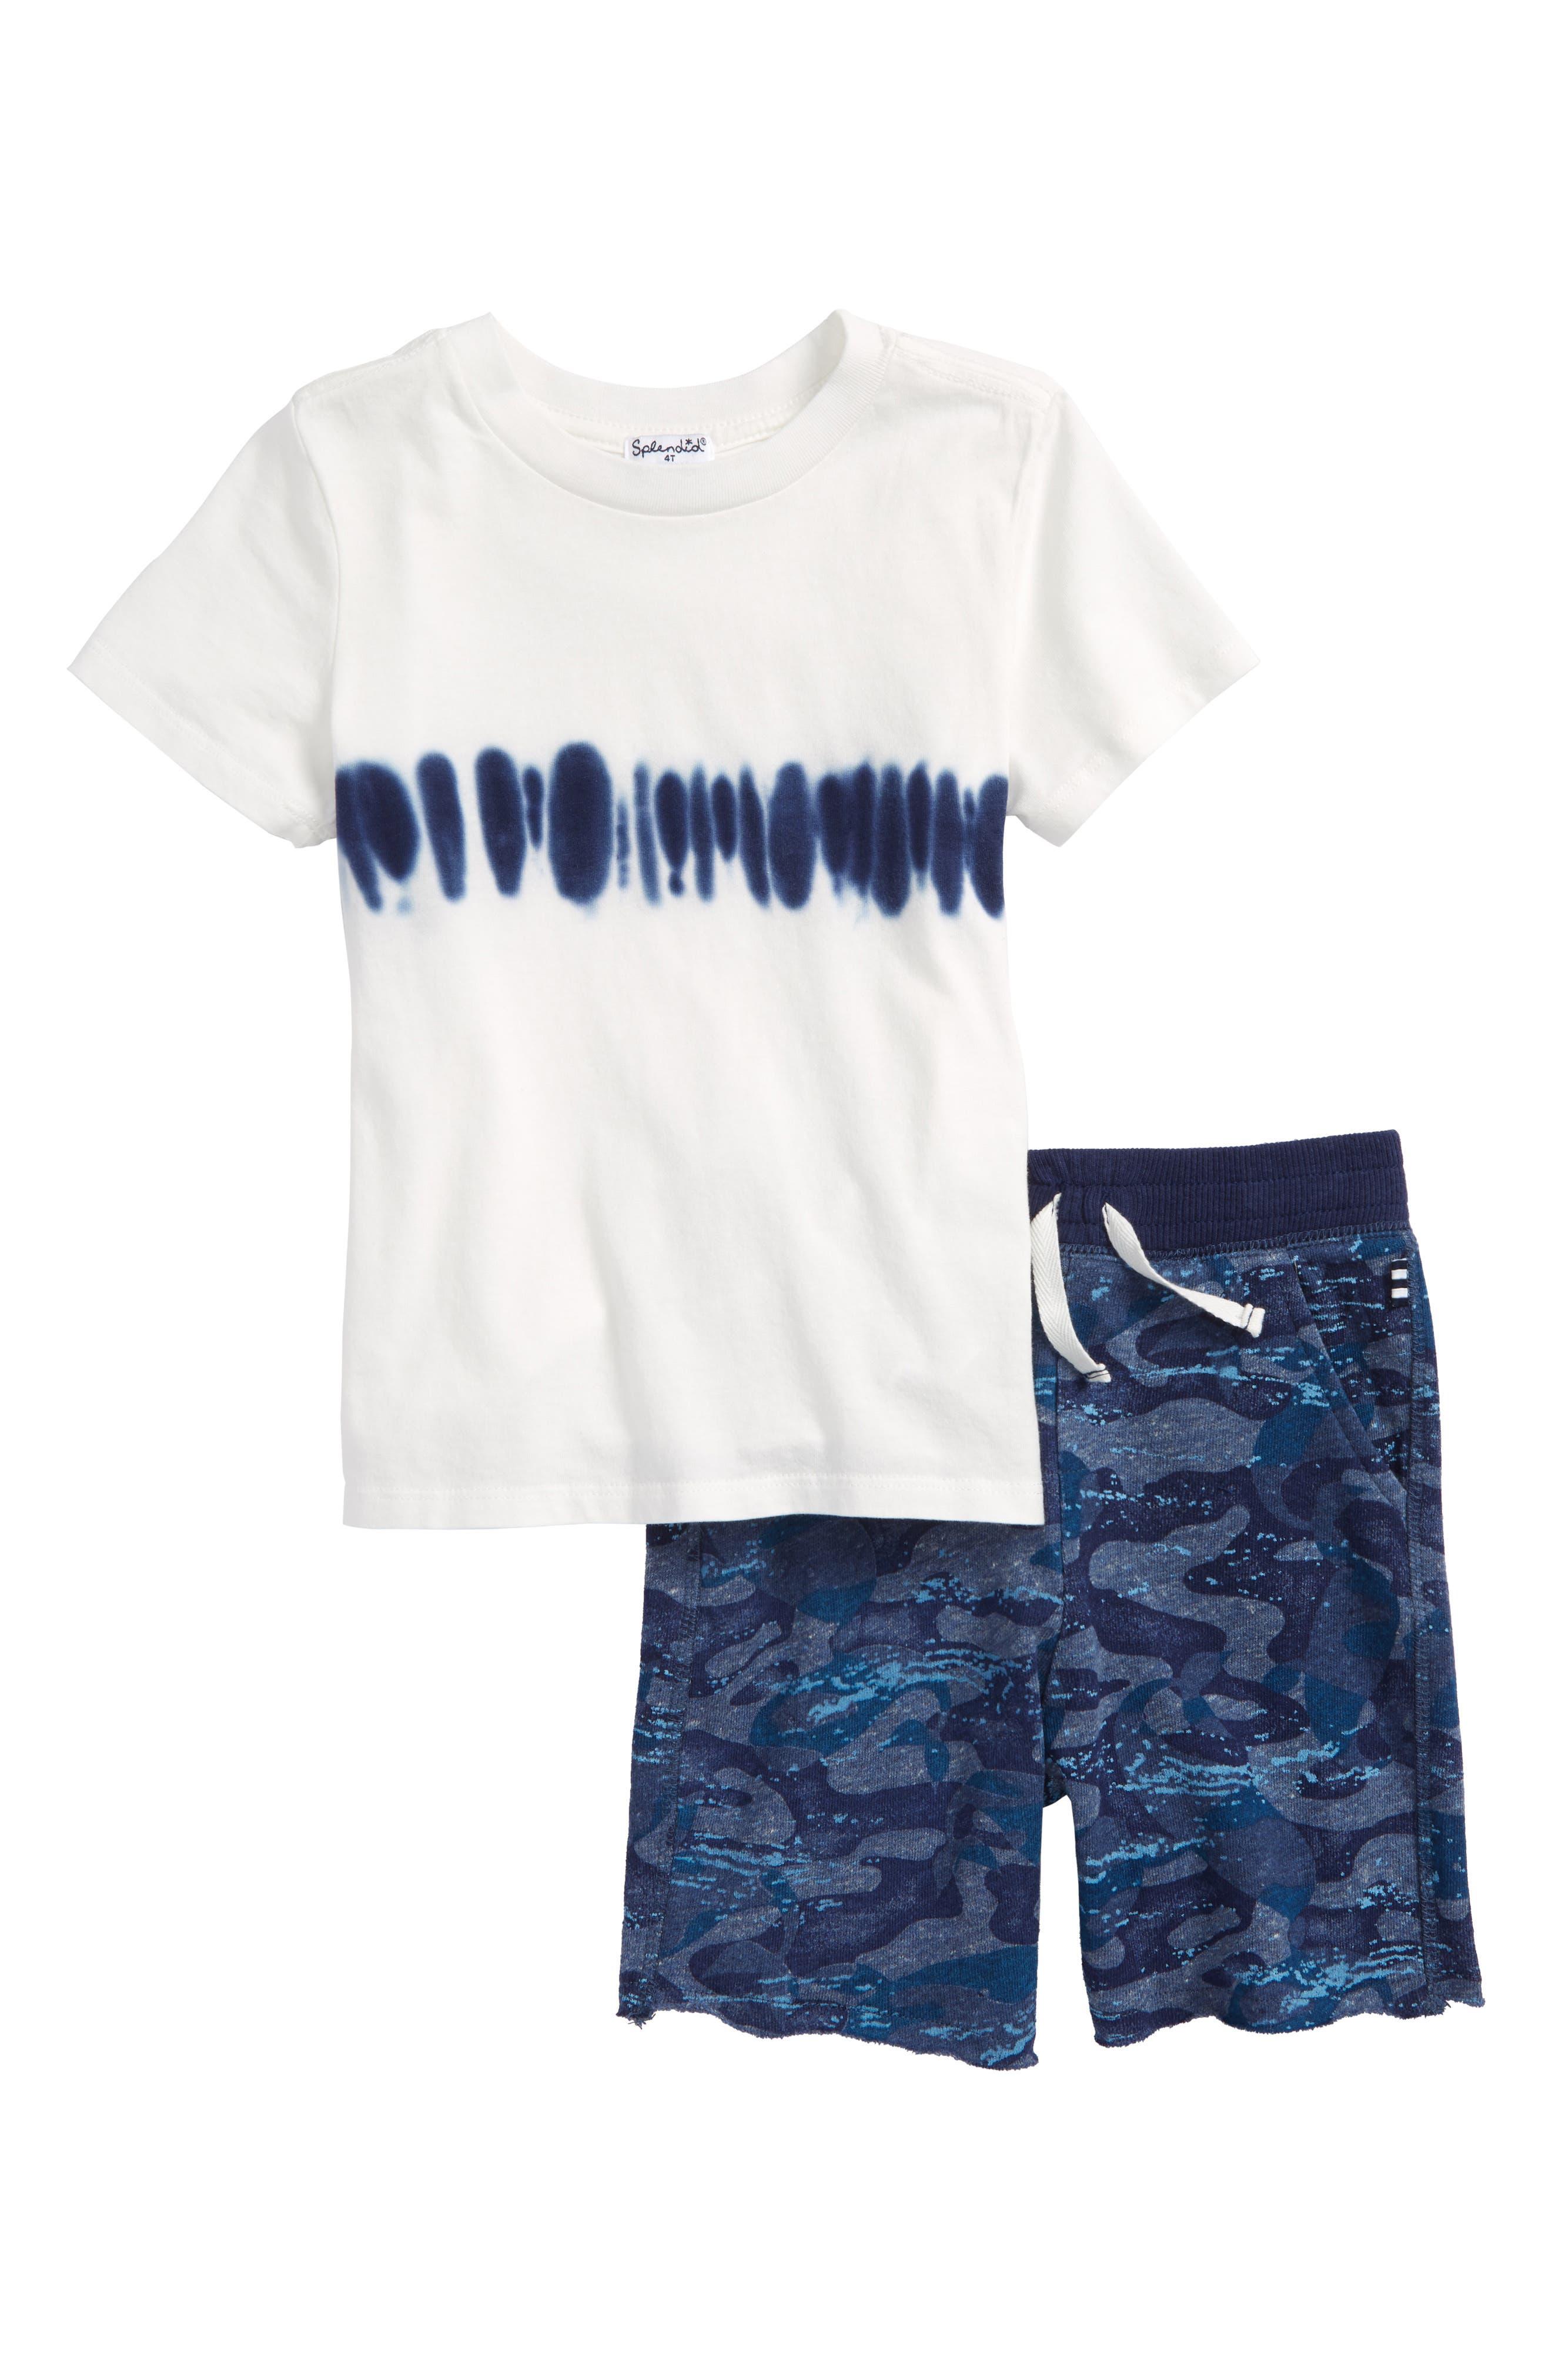 Splendid Tie Dye T-Shirt & Whale Camo Shorts Set (Toddler Boys & Little Boys)